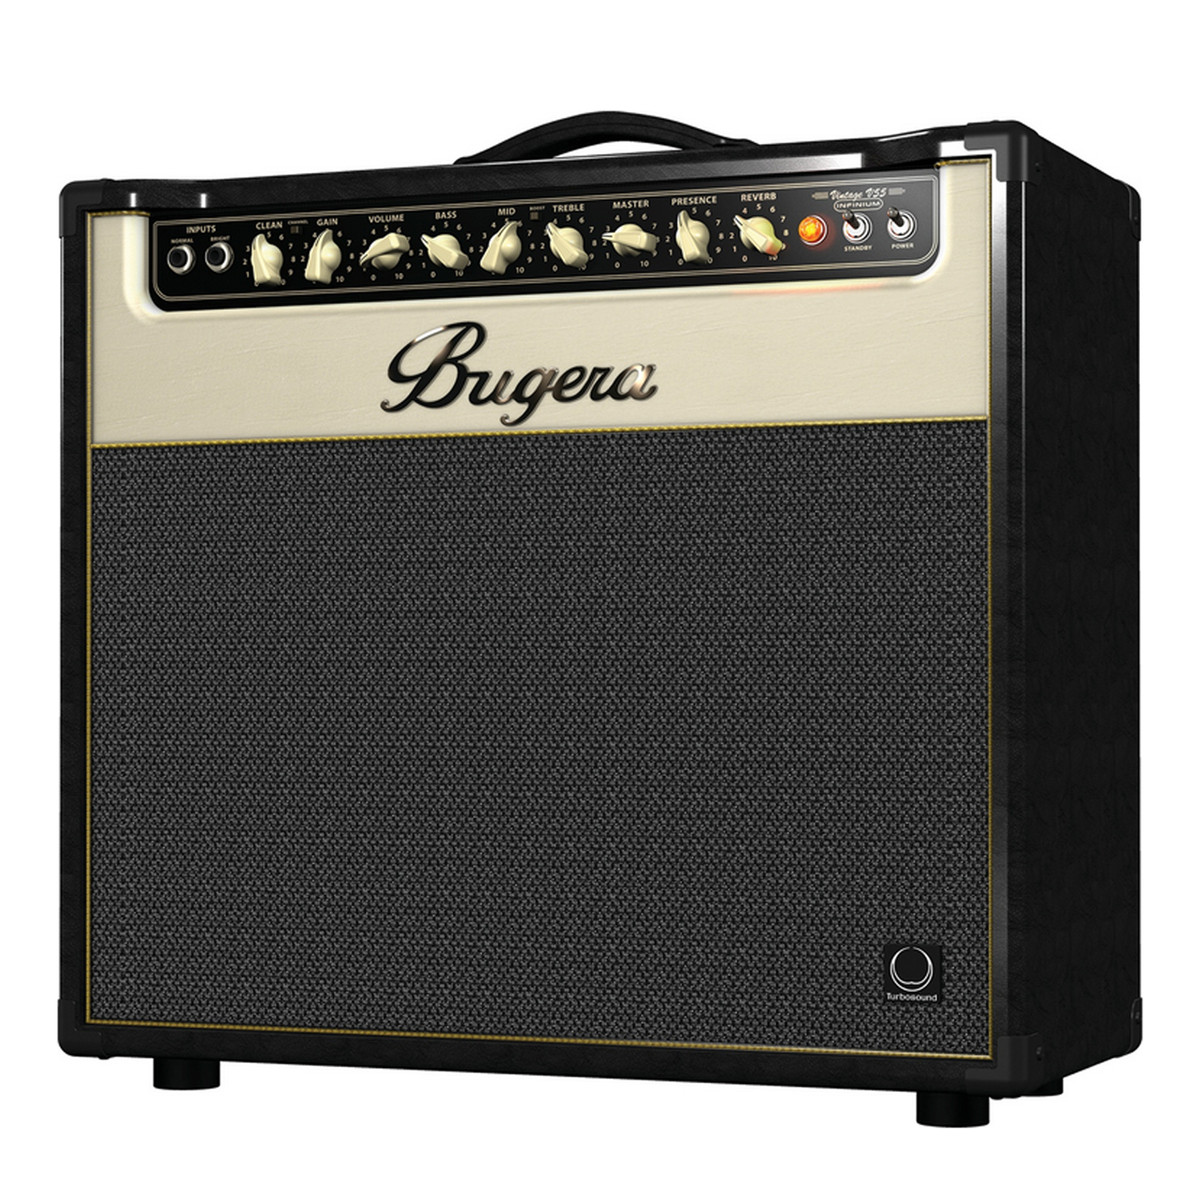 Bugera v55 infinium 55 watt vintage 2 channel tube combo amp b stock